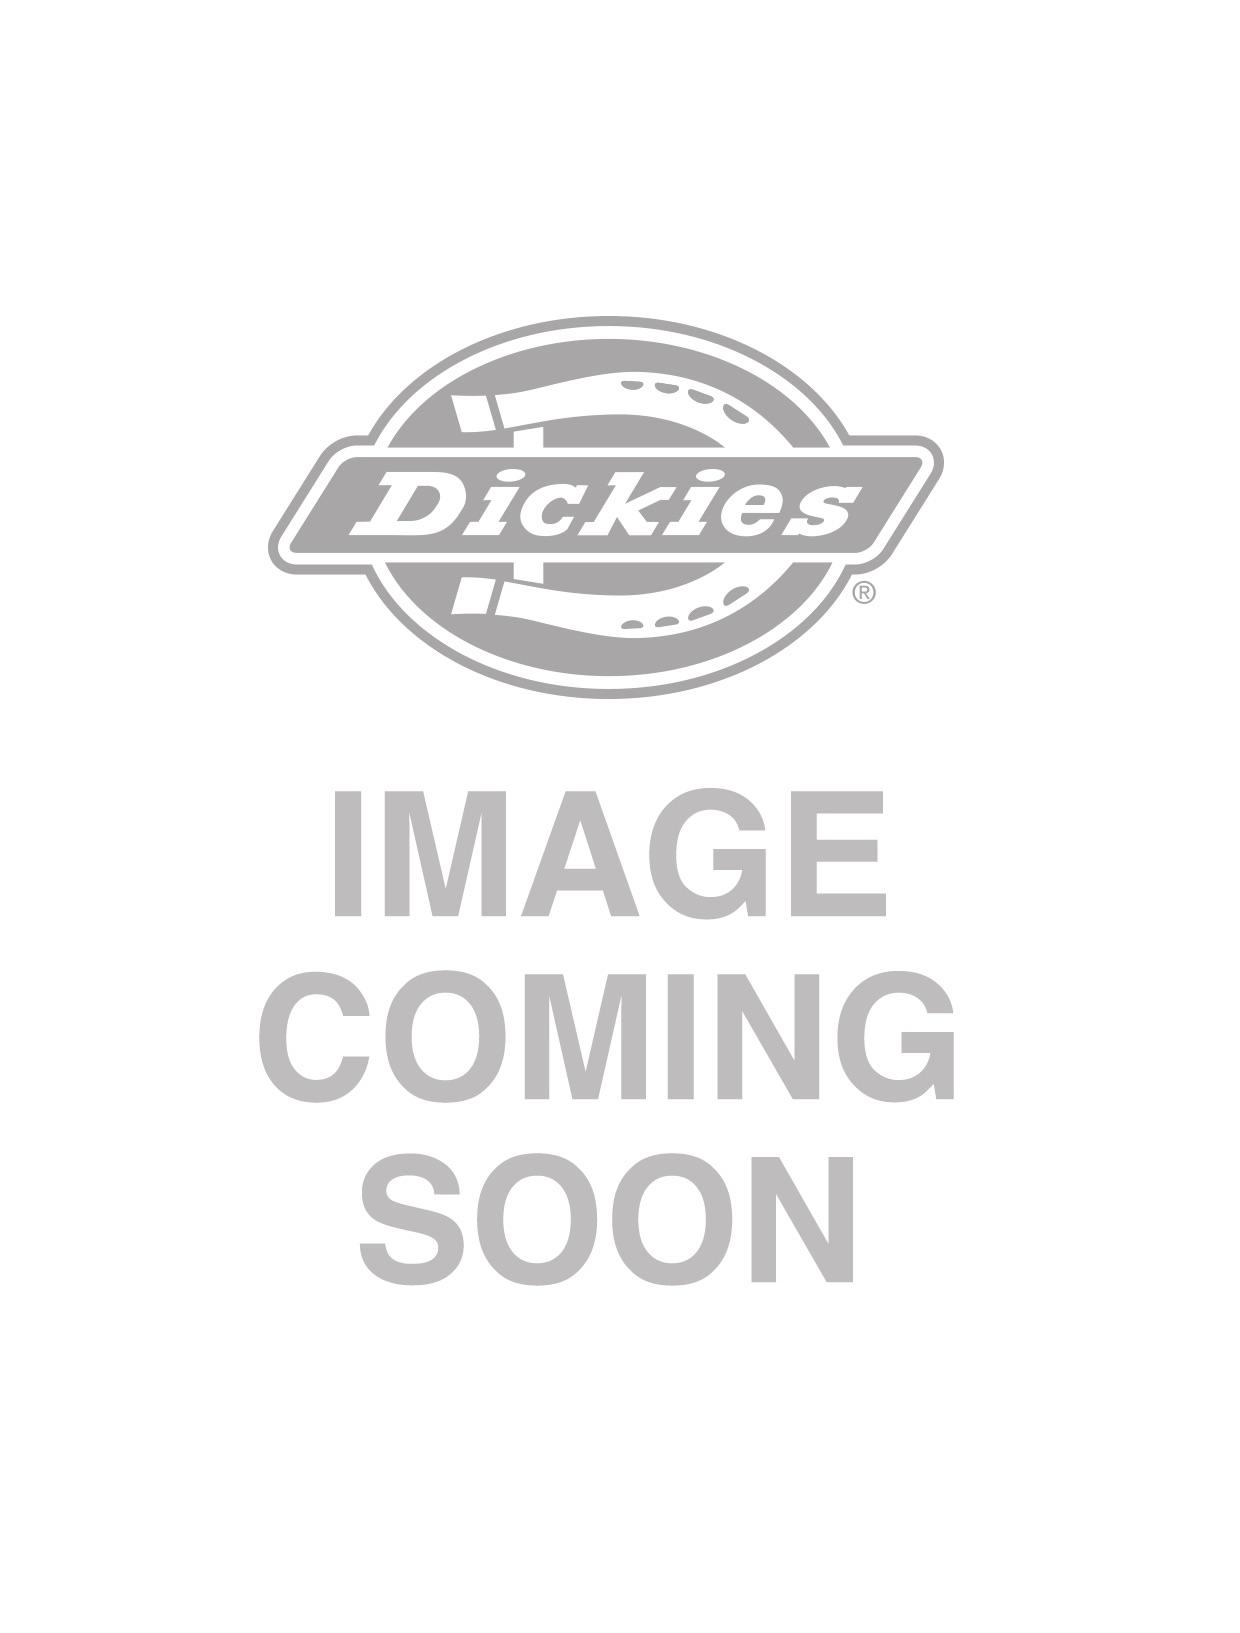 Dickies Mackville T-Shirt